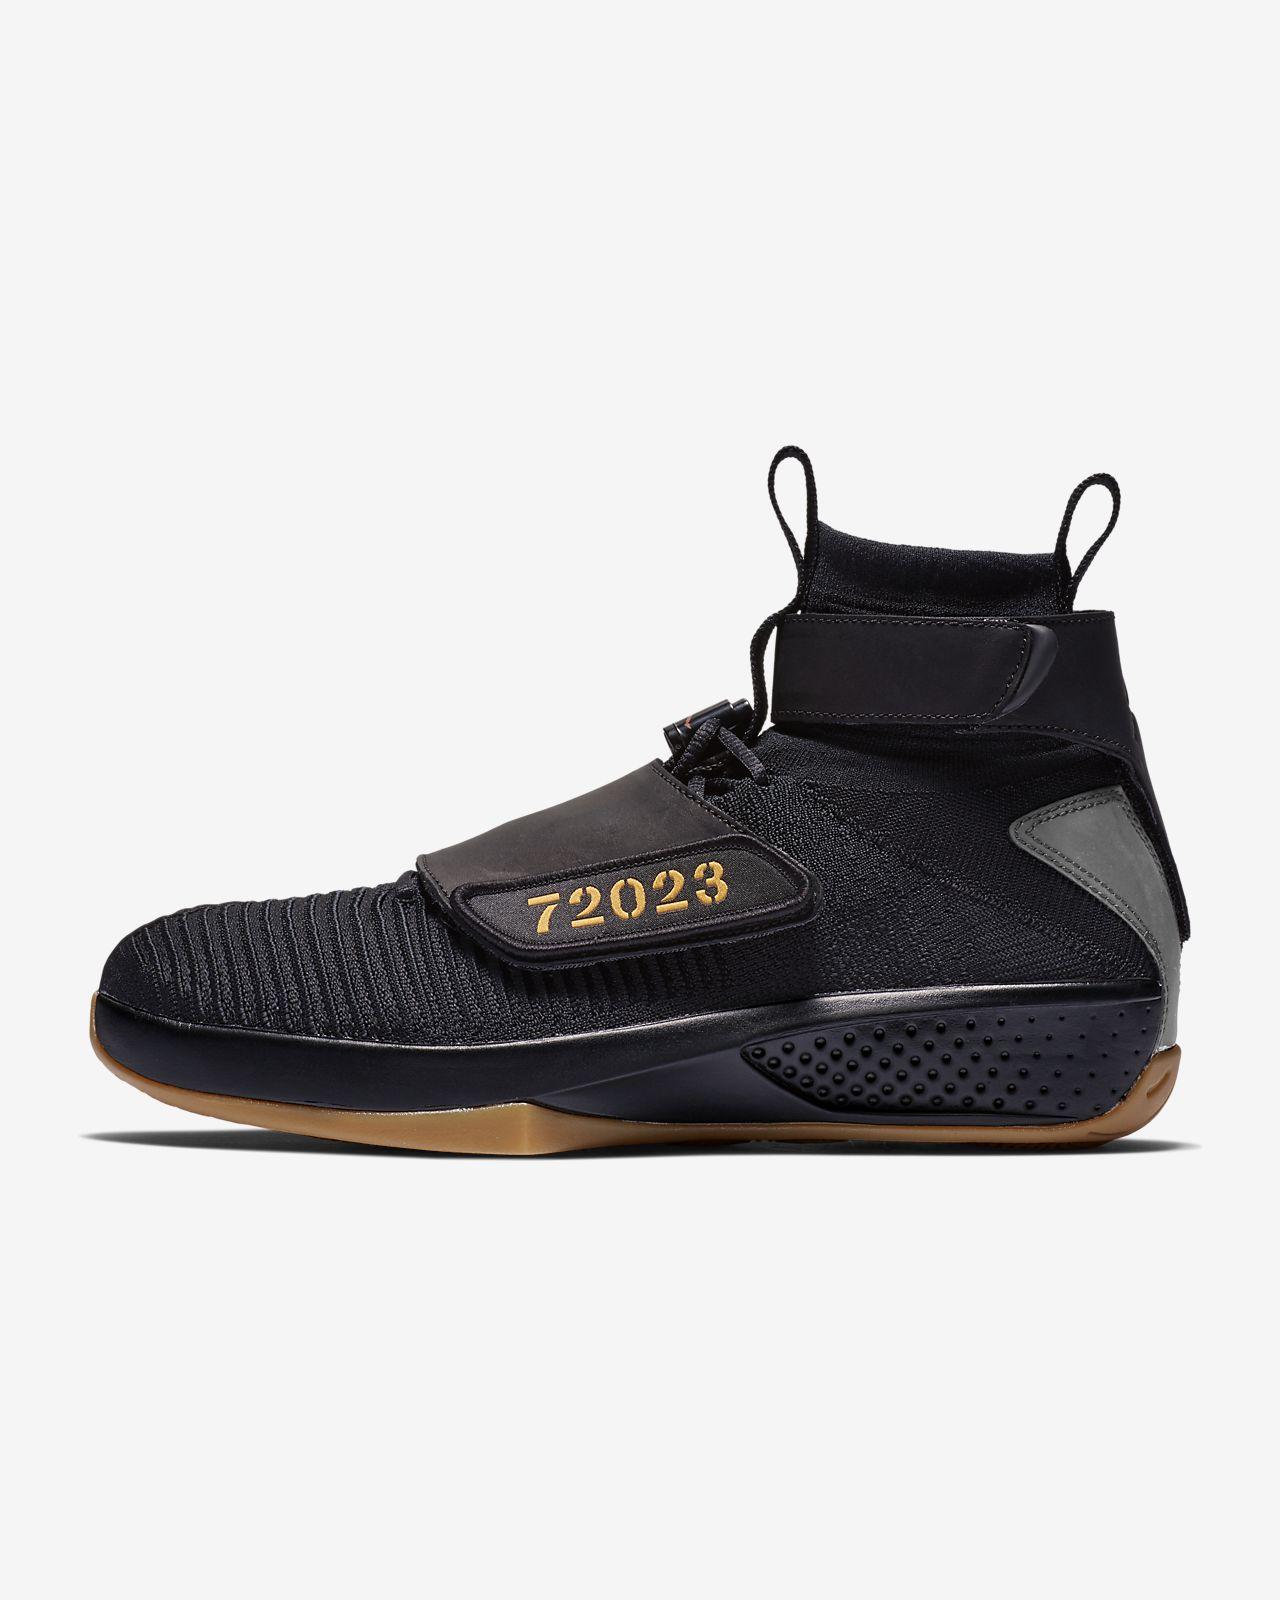 low priced 016f1 54475 ... discount code for air jordan xx flyknit x rag bone x carmelo anthony sko  til mænd